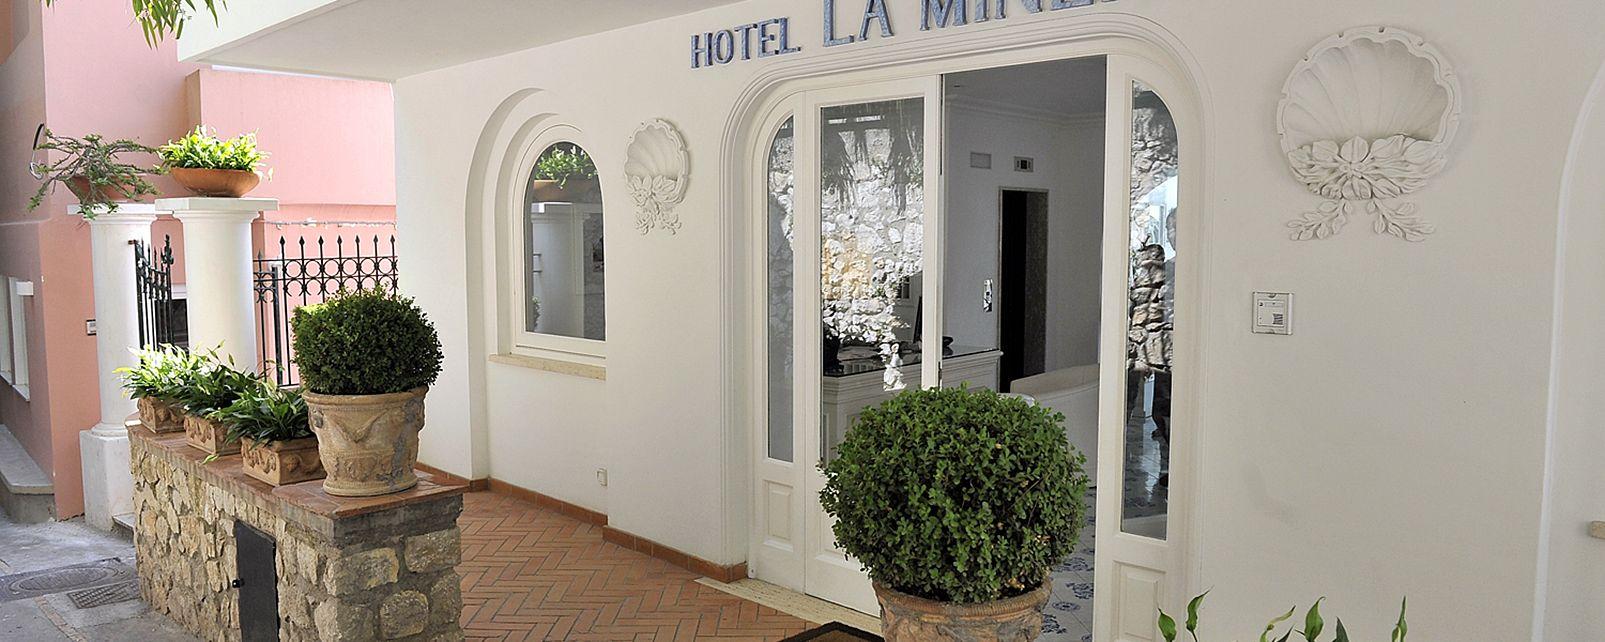 Hotel La Minerva